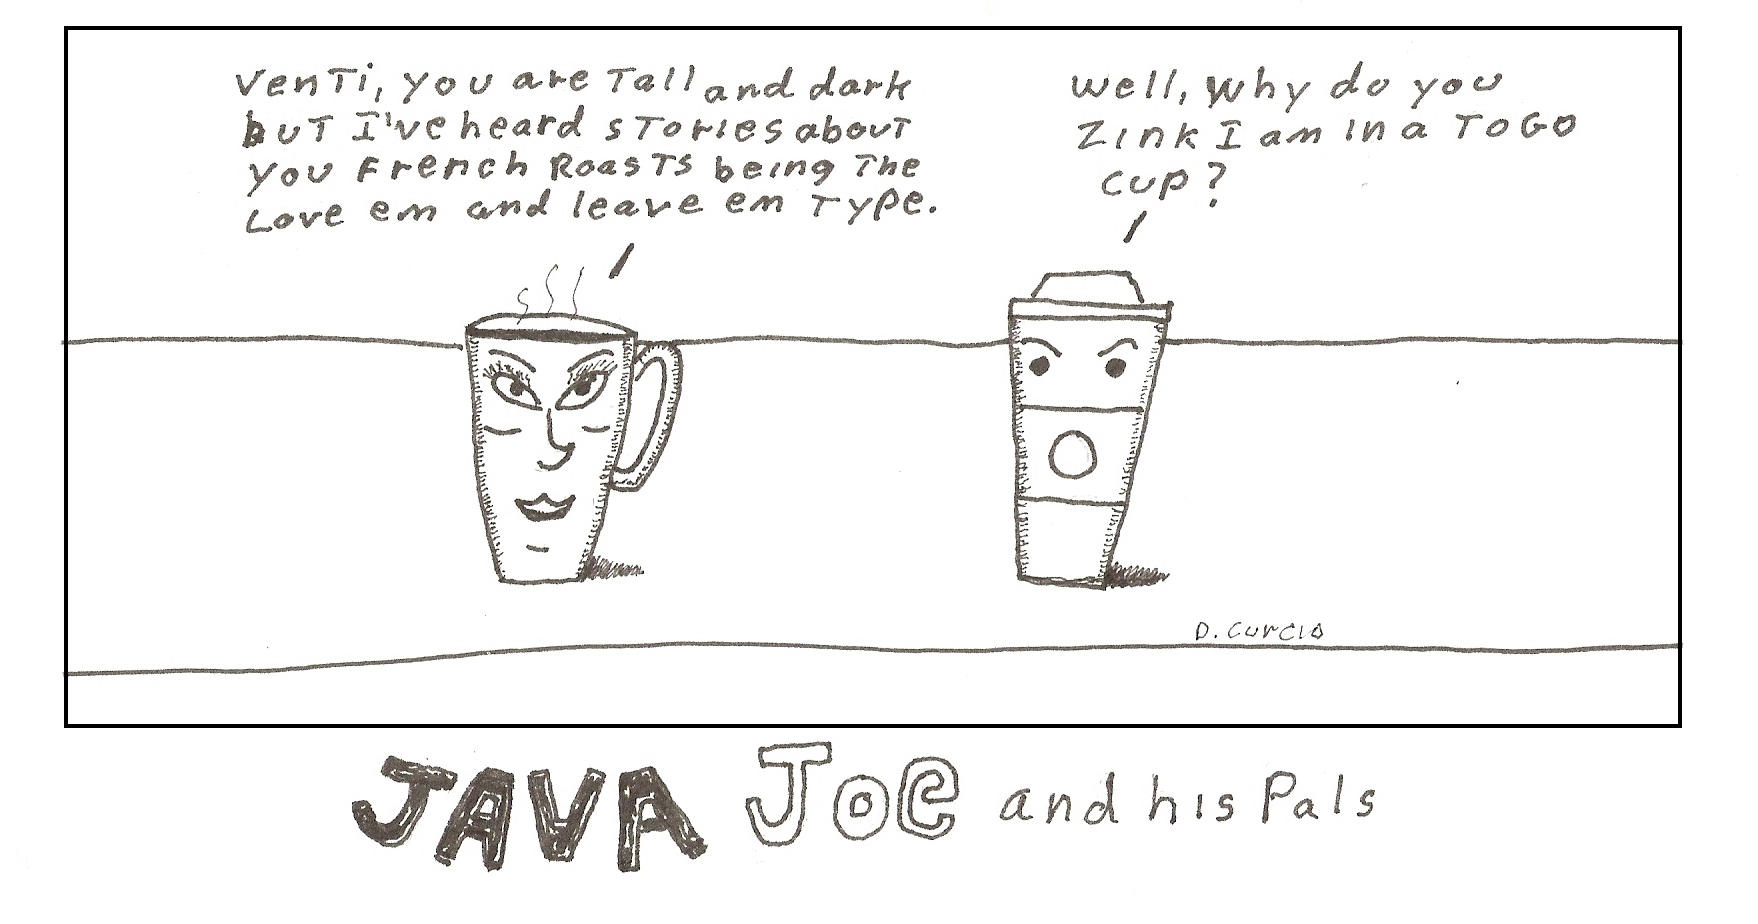 Java Joe Venti 5 End